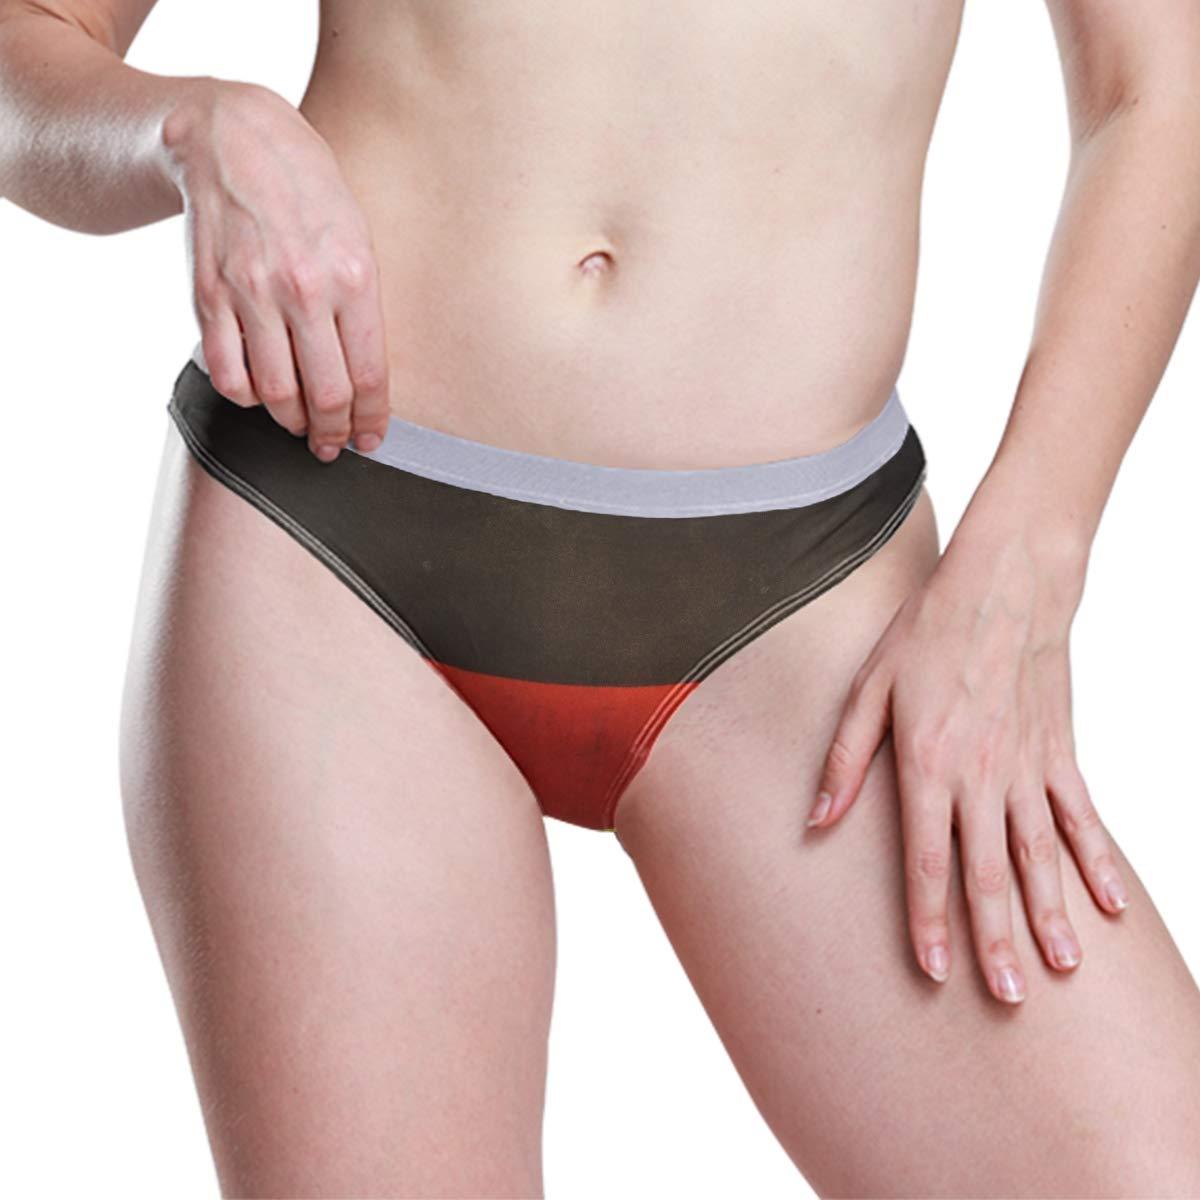 FAJRO Grunge German Flag Womens Low-Rise Underwear Panties Spandex